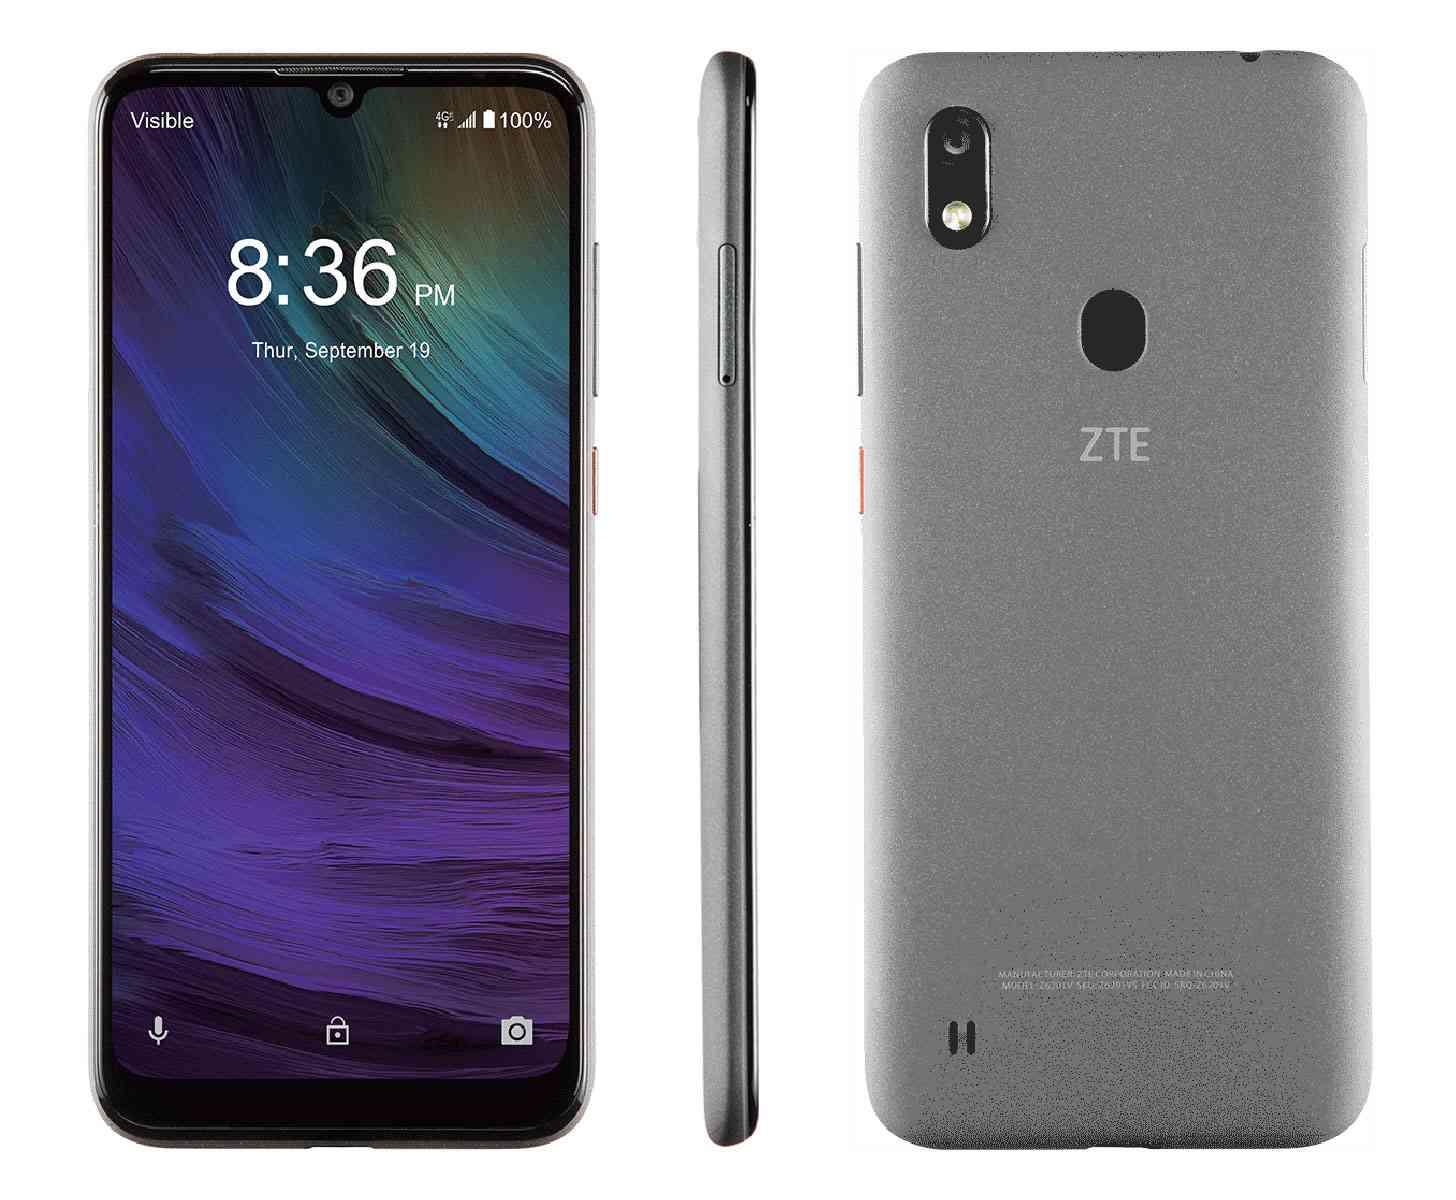 Обзор смартфона ZTE Blade A7 Prime с основными характеристиками